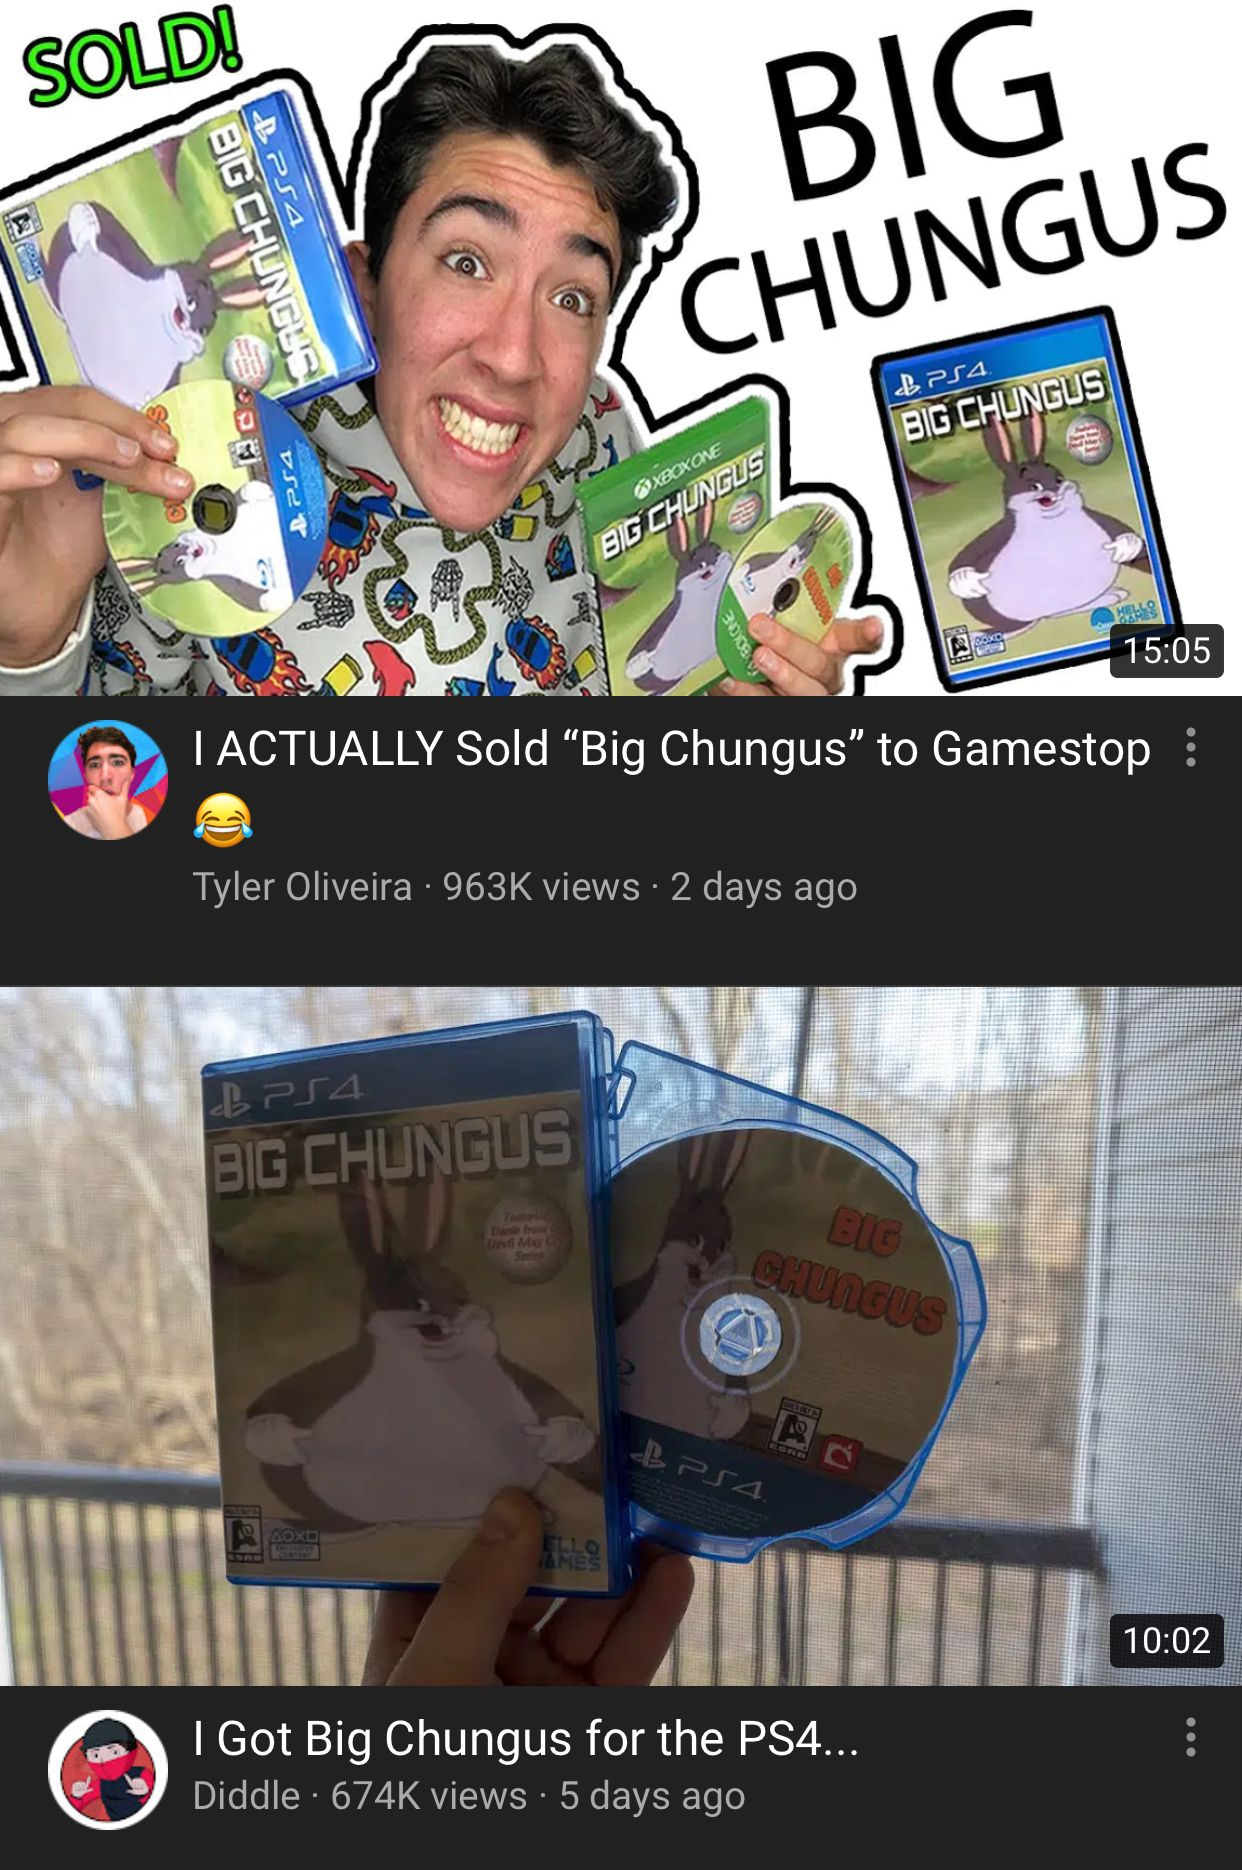 Bįg Chungus Meme 2019 Big Chungus My Unfunny Memes